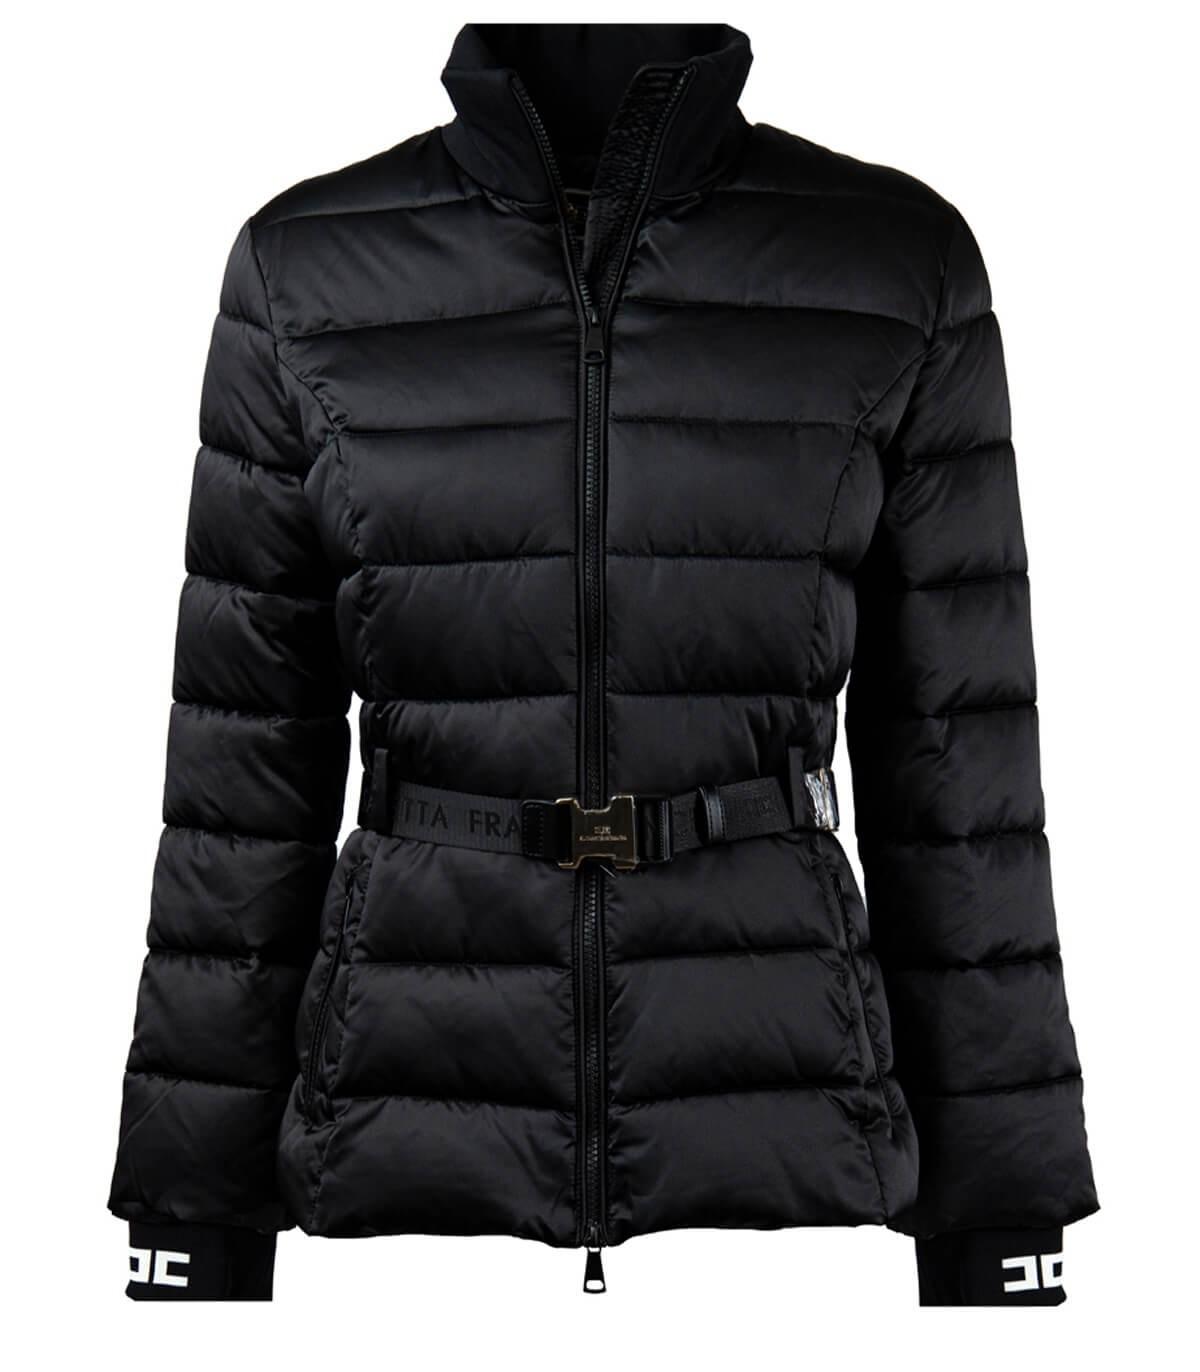 Elisabetta Franchi Black Padded Coat With Belt In Nero